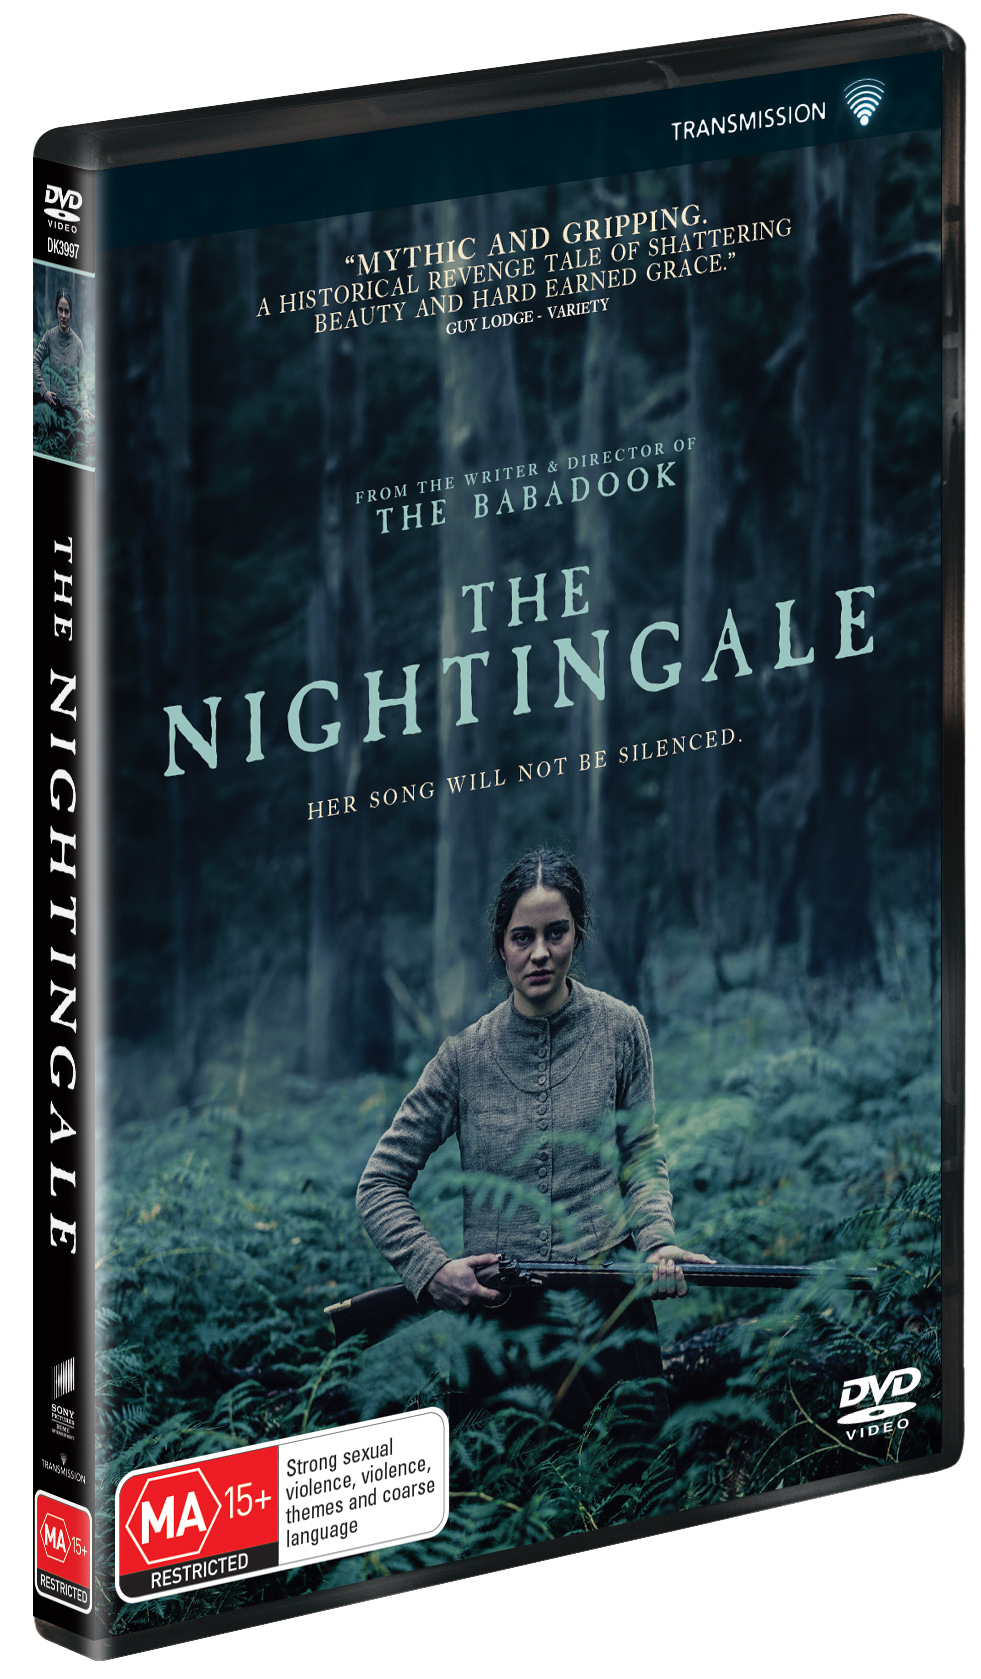 DK3997 THE NIGHTINGALE DVD-3D